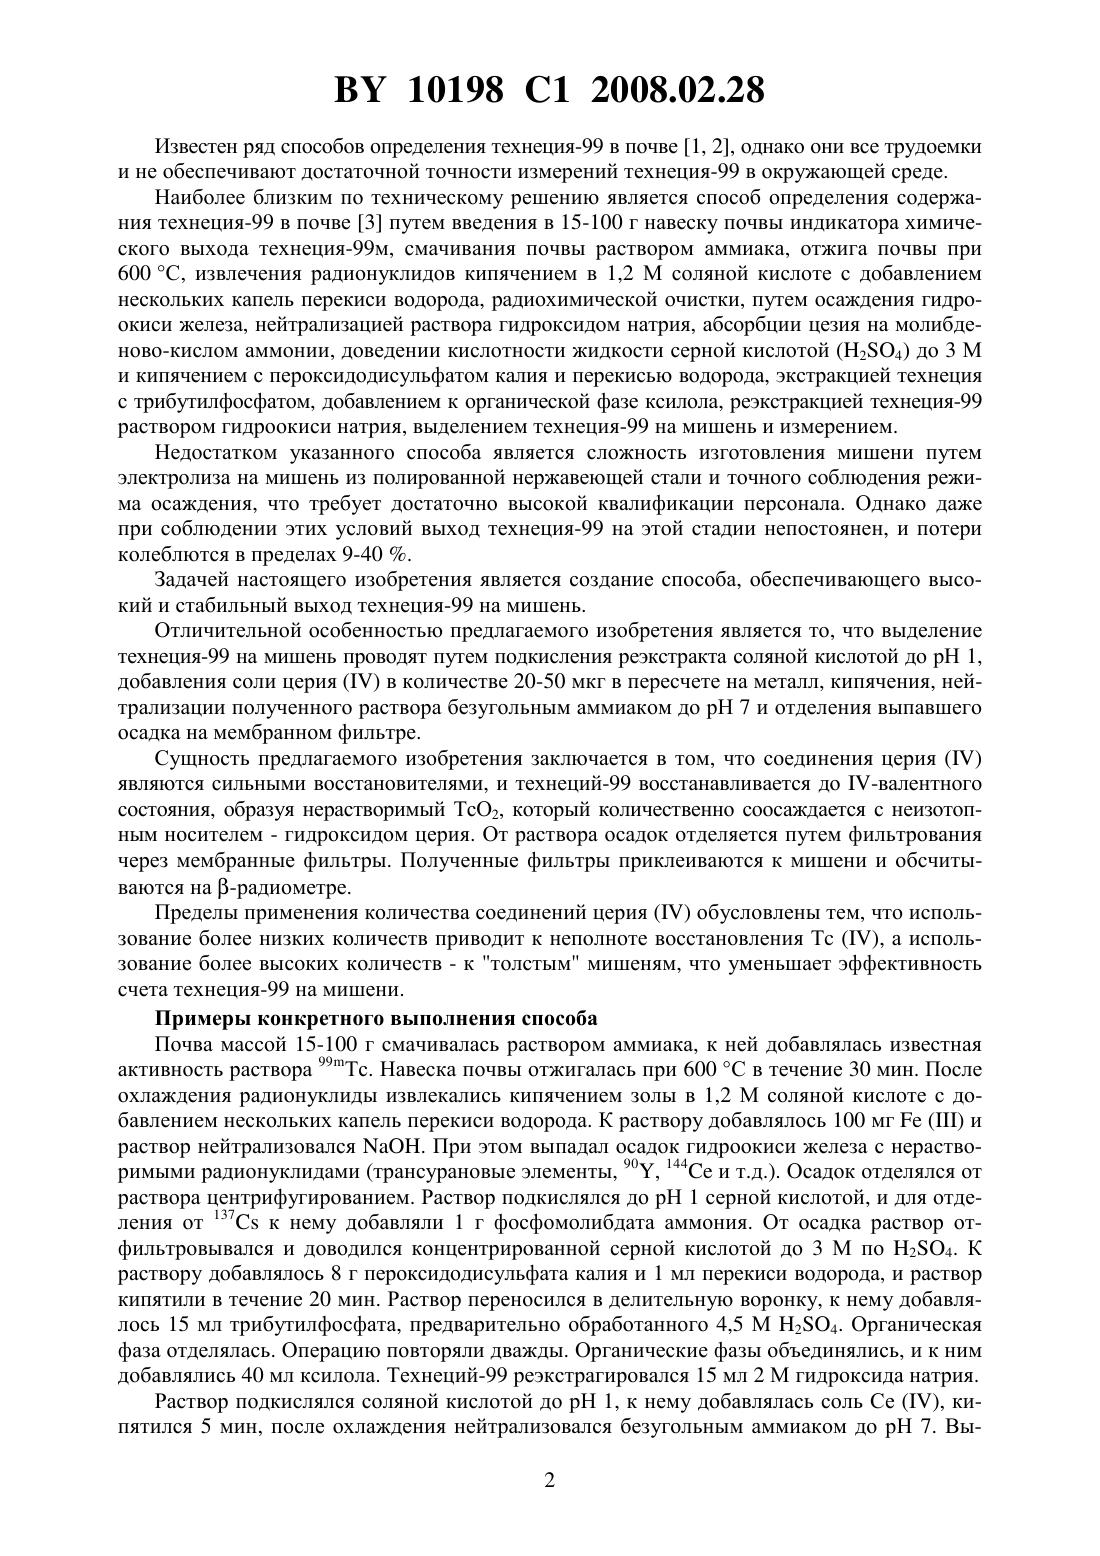 Технеций-99